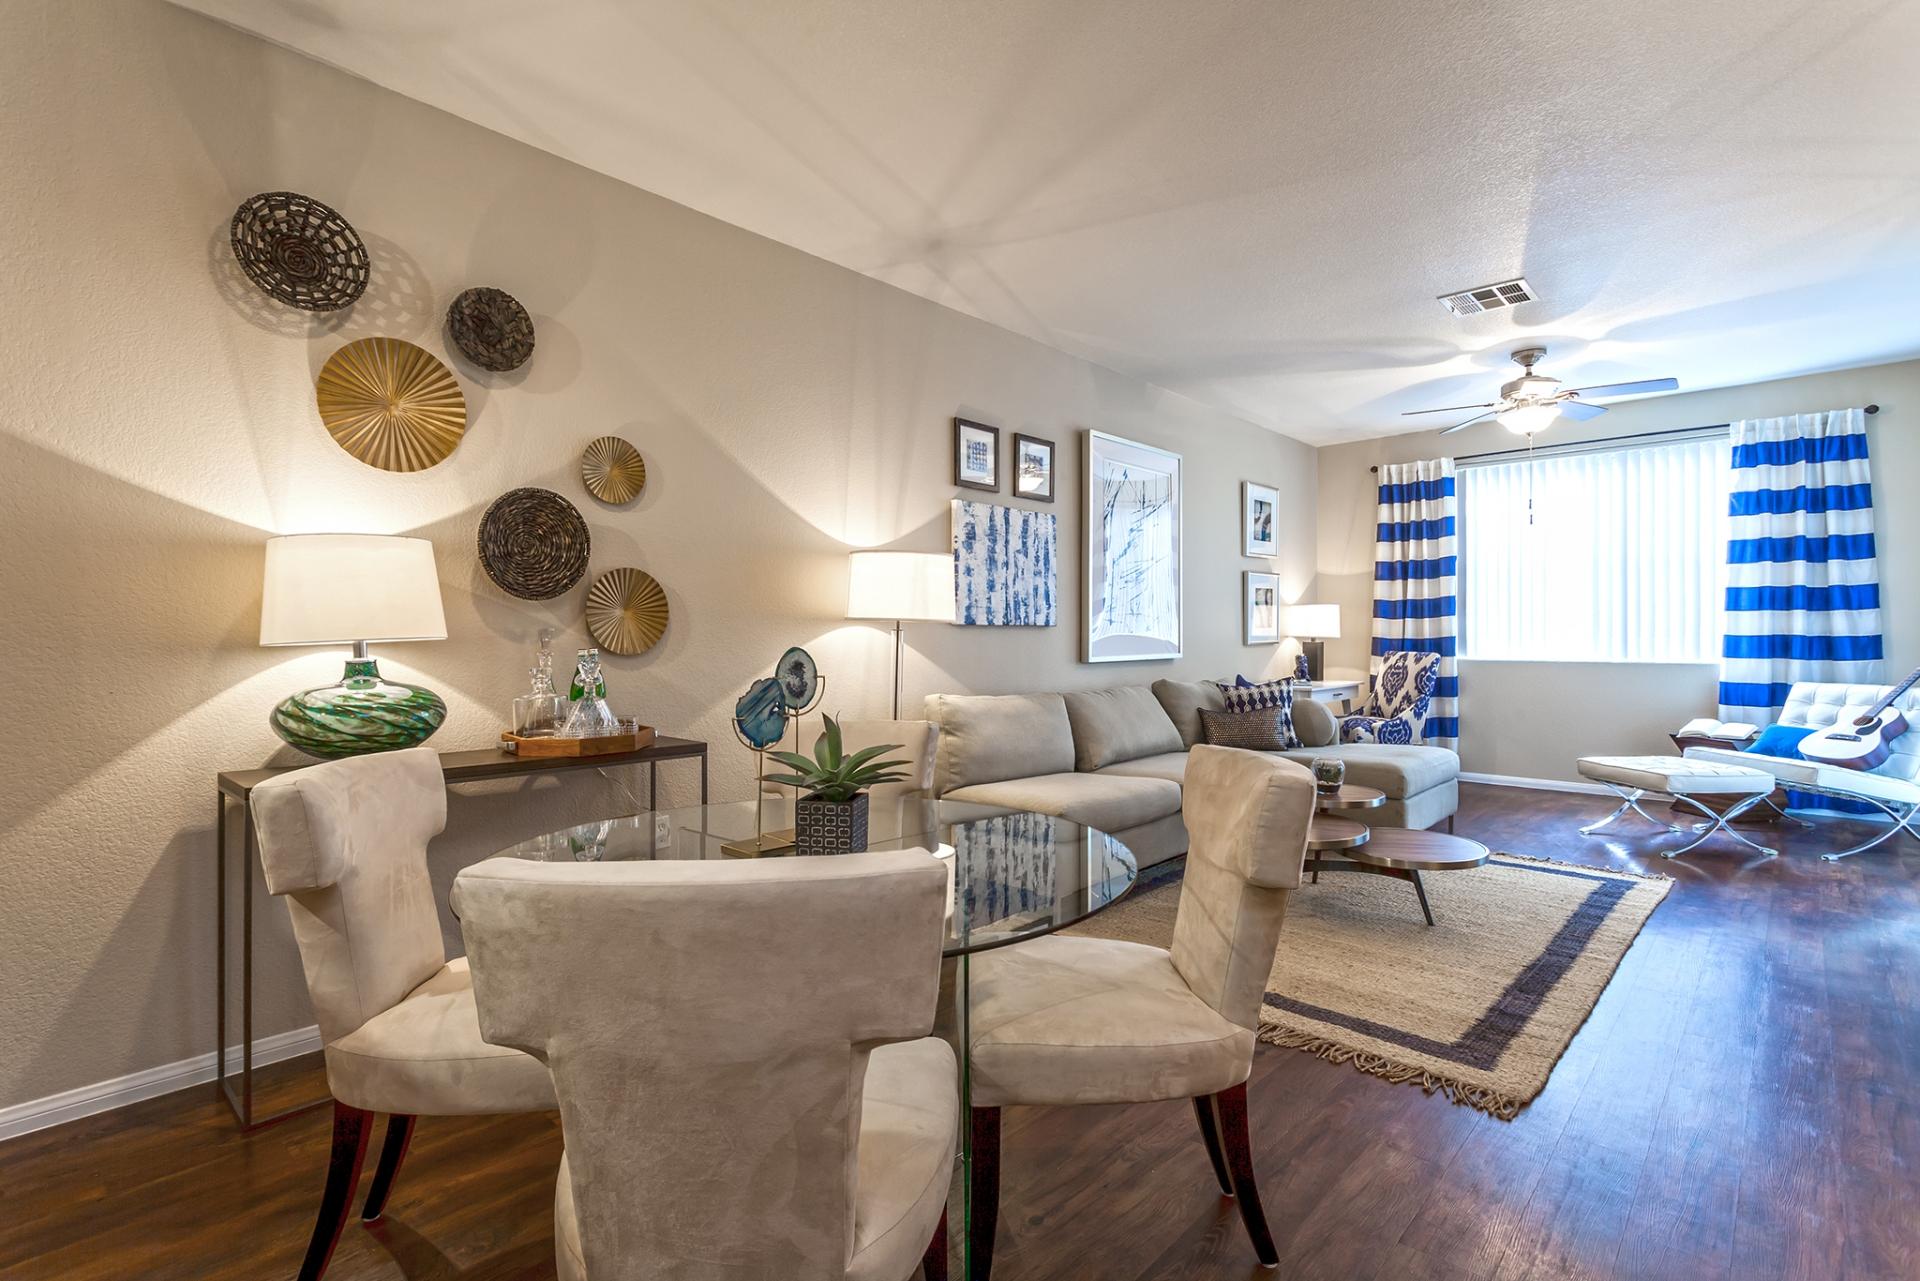 Camden Crown Valley Apartments image 2